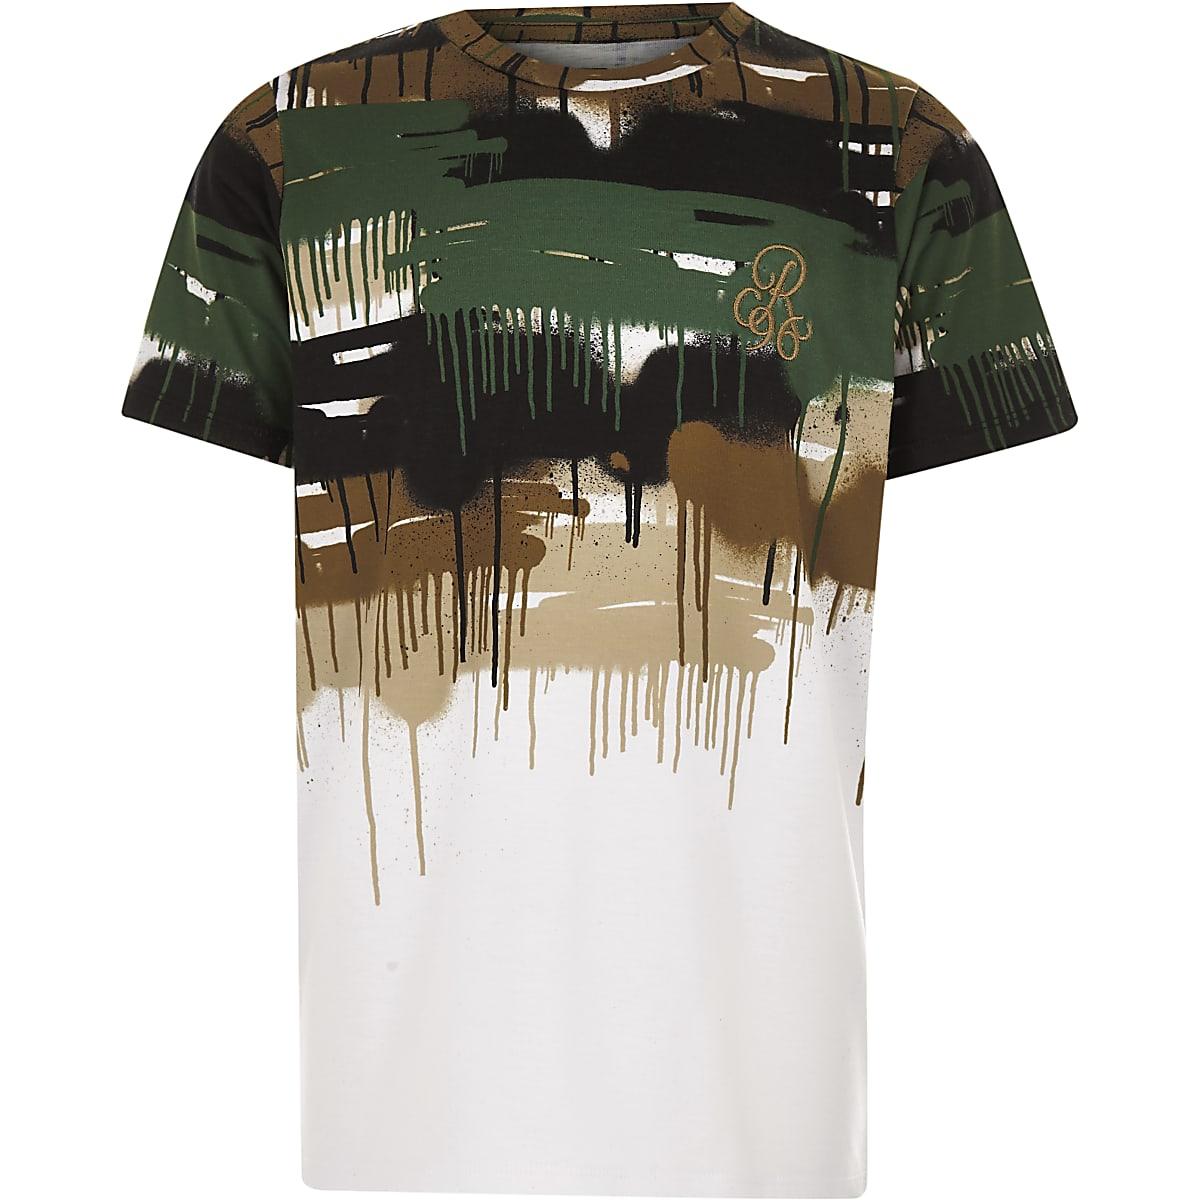 8fa93a5a Boys white 'R96' camo drip faded T-shirt - T-shirts - T-Shirts & Vests -  boys